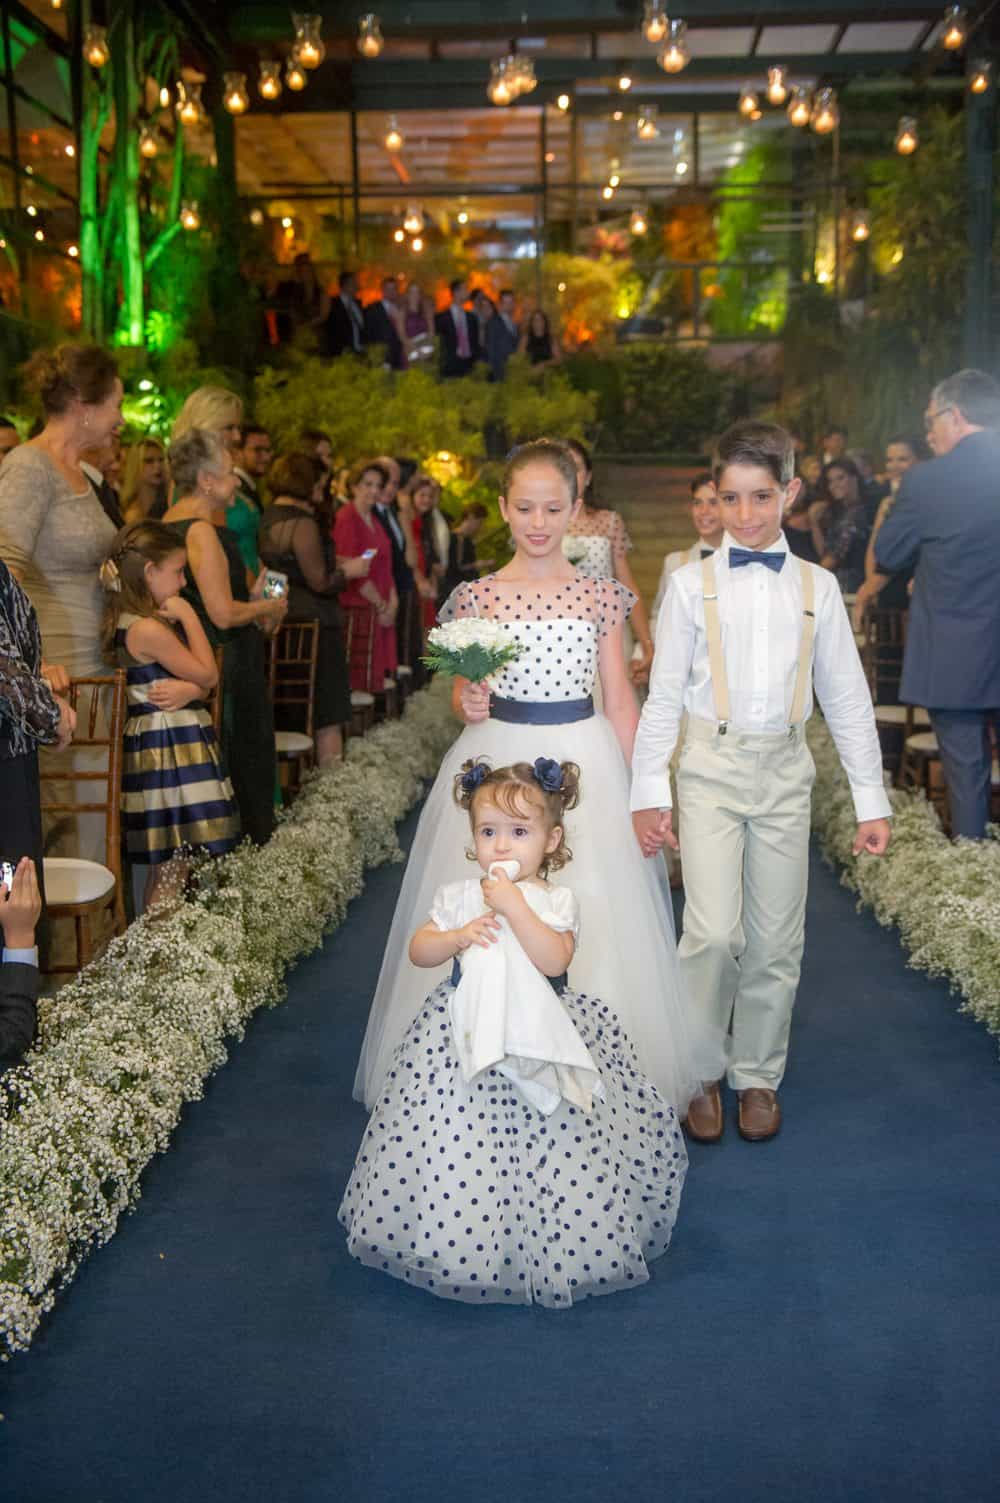 casamento-carol-e-paulo-caseme-marina-fava-fotografia-9